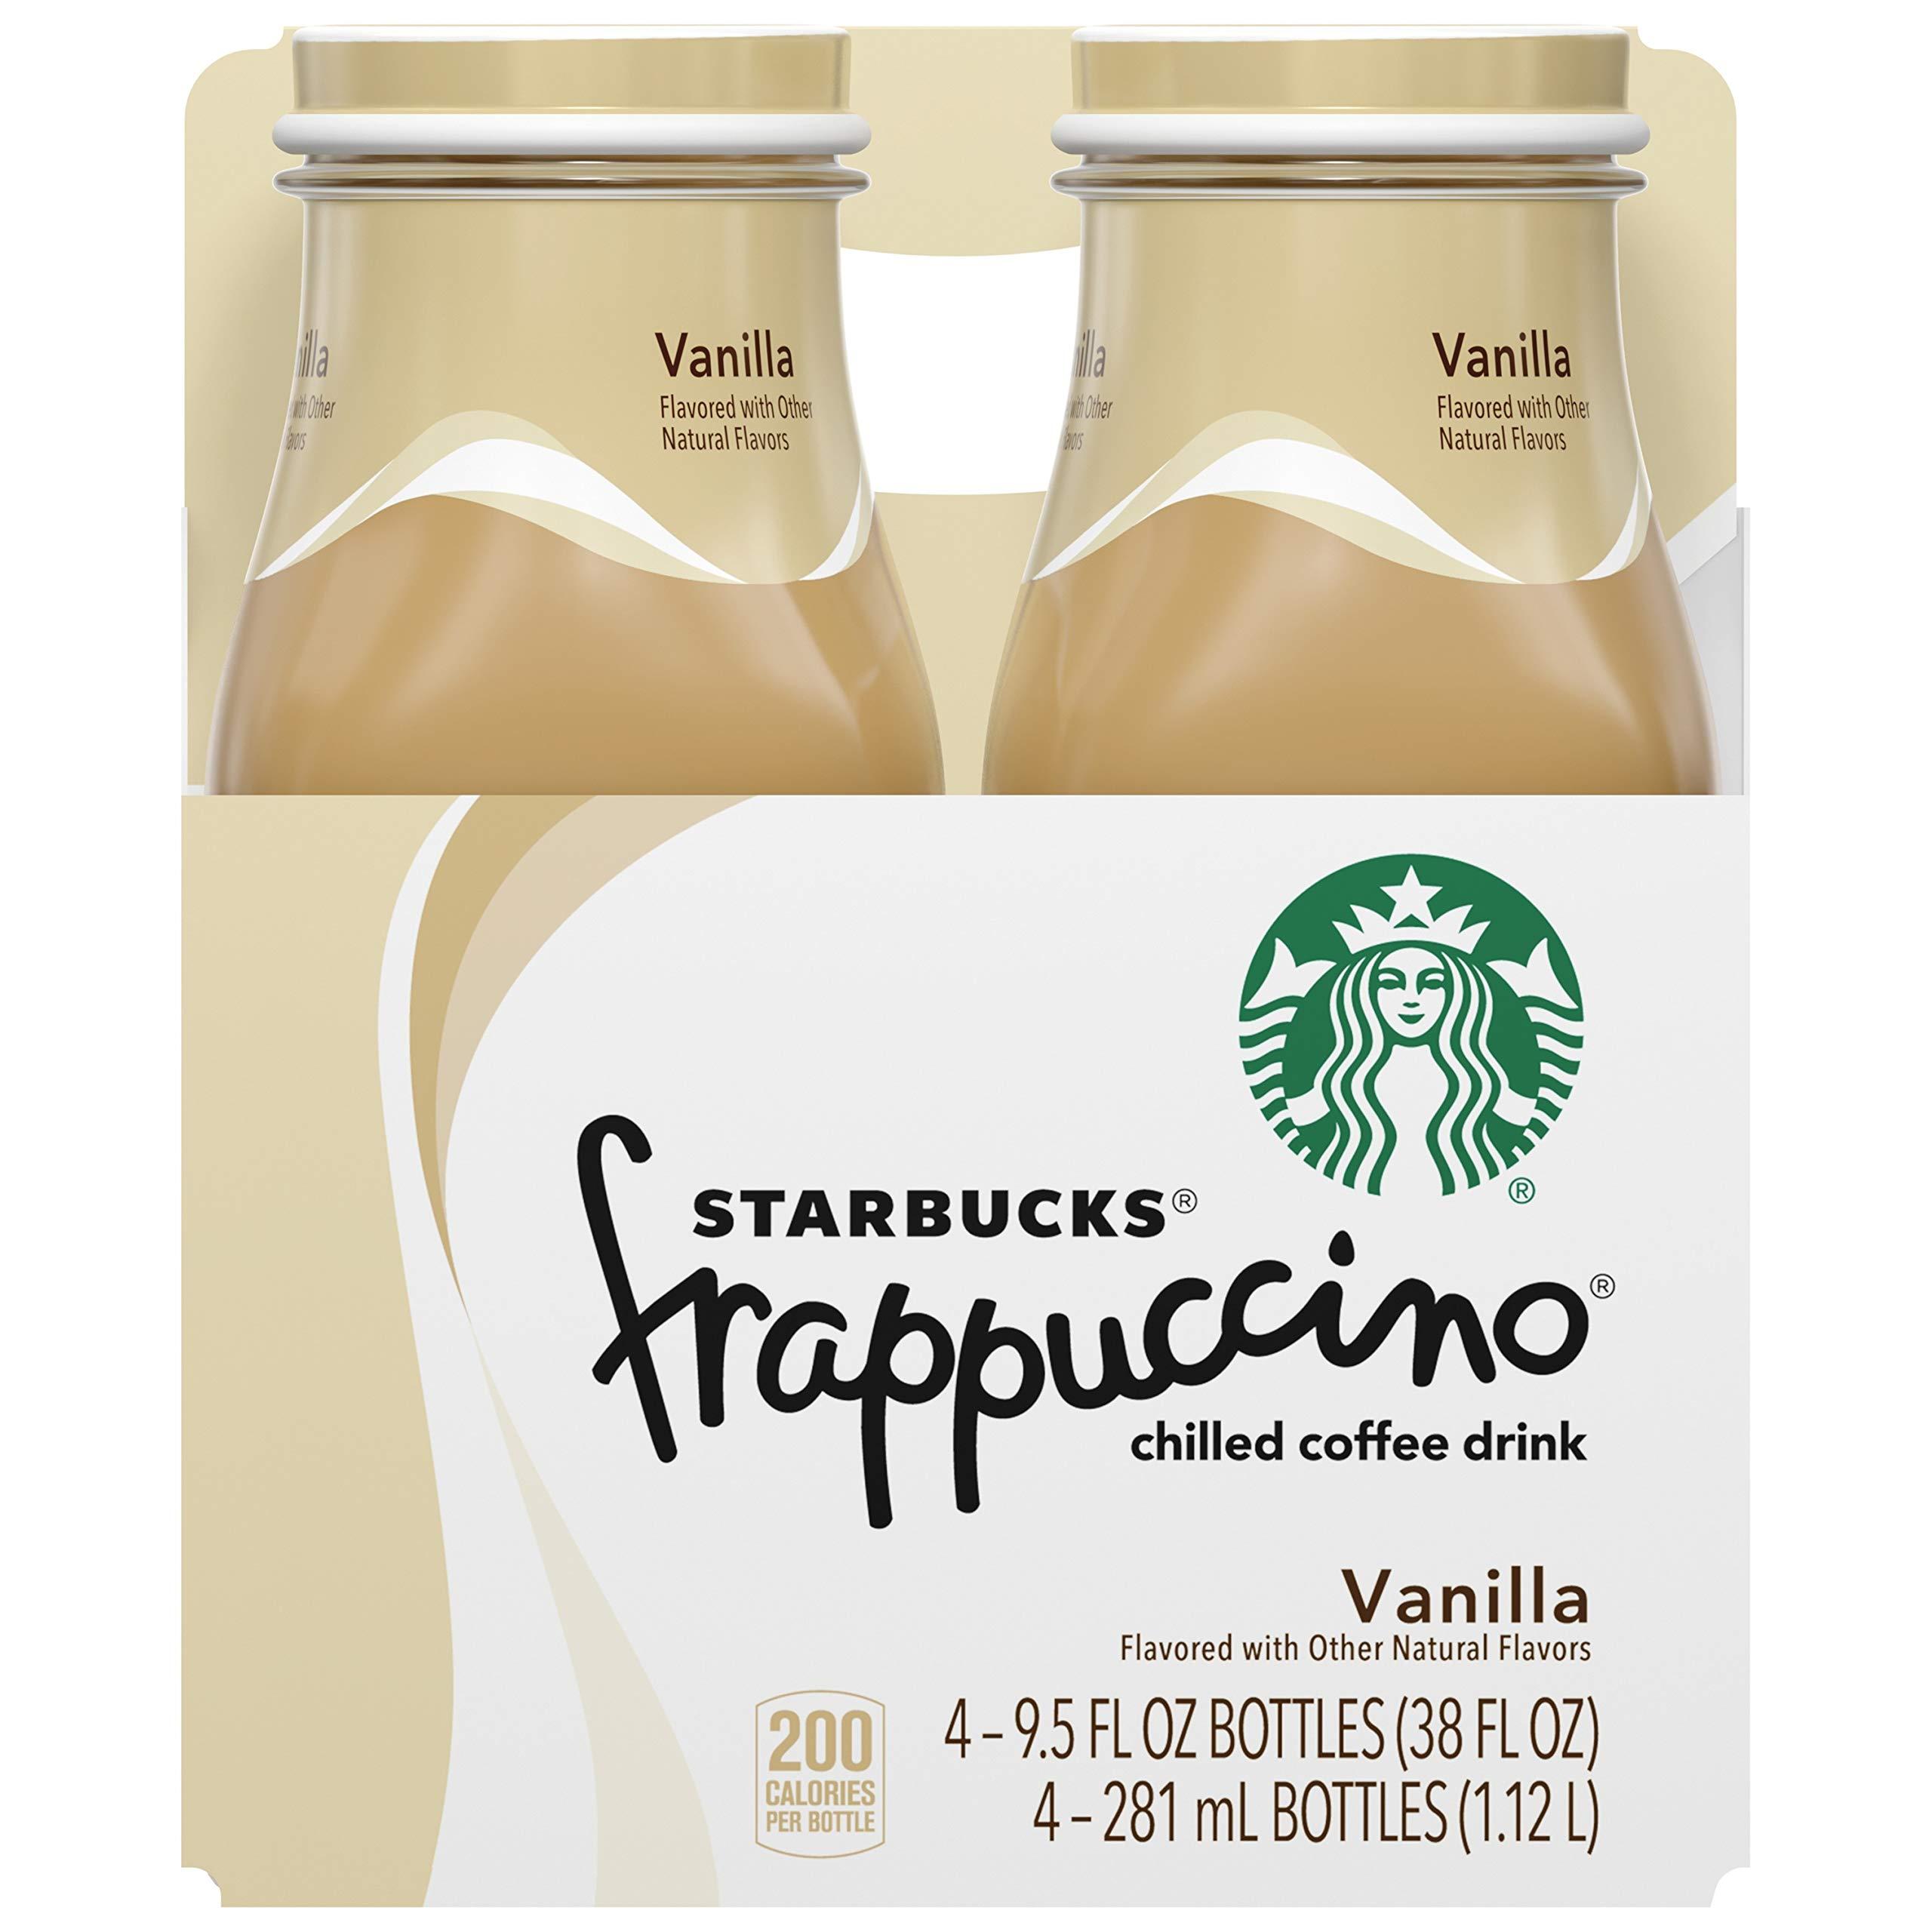 Starbucks Frappuccino Vanilla Coffee Beverage, 9.5 oz glass bottles (4 Pack)